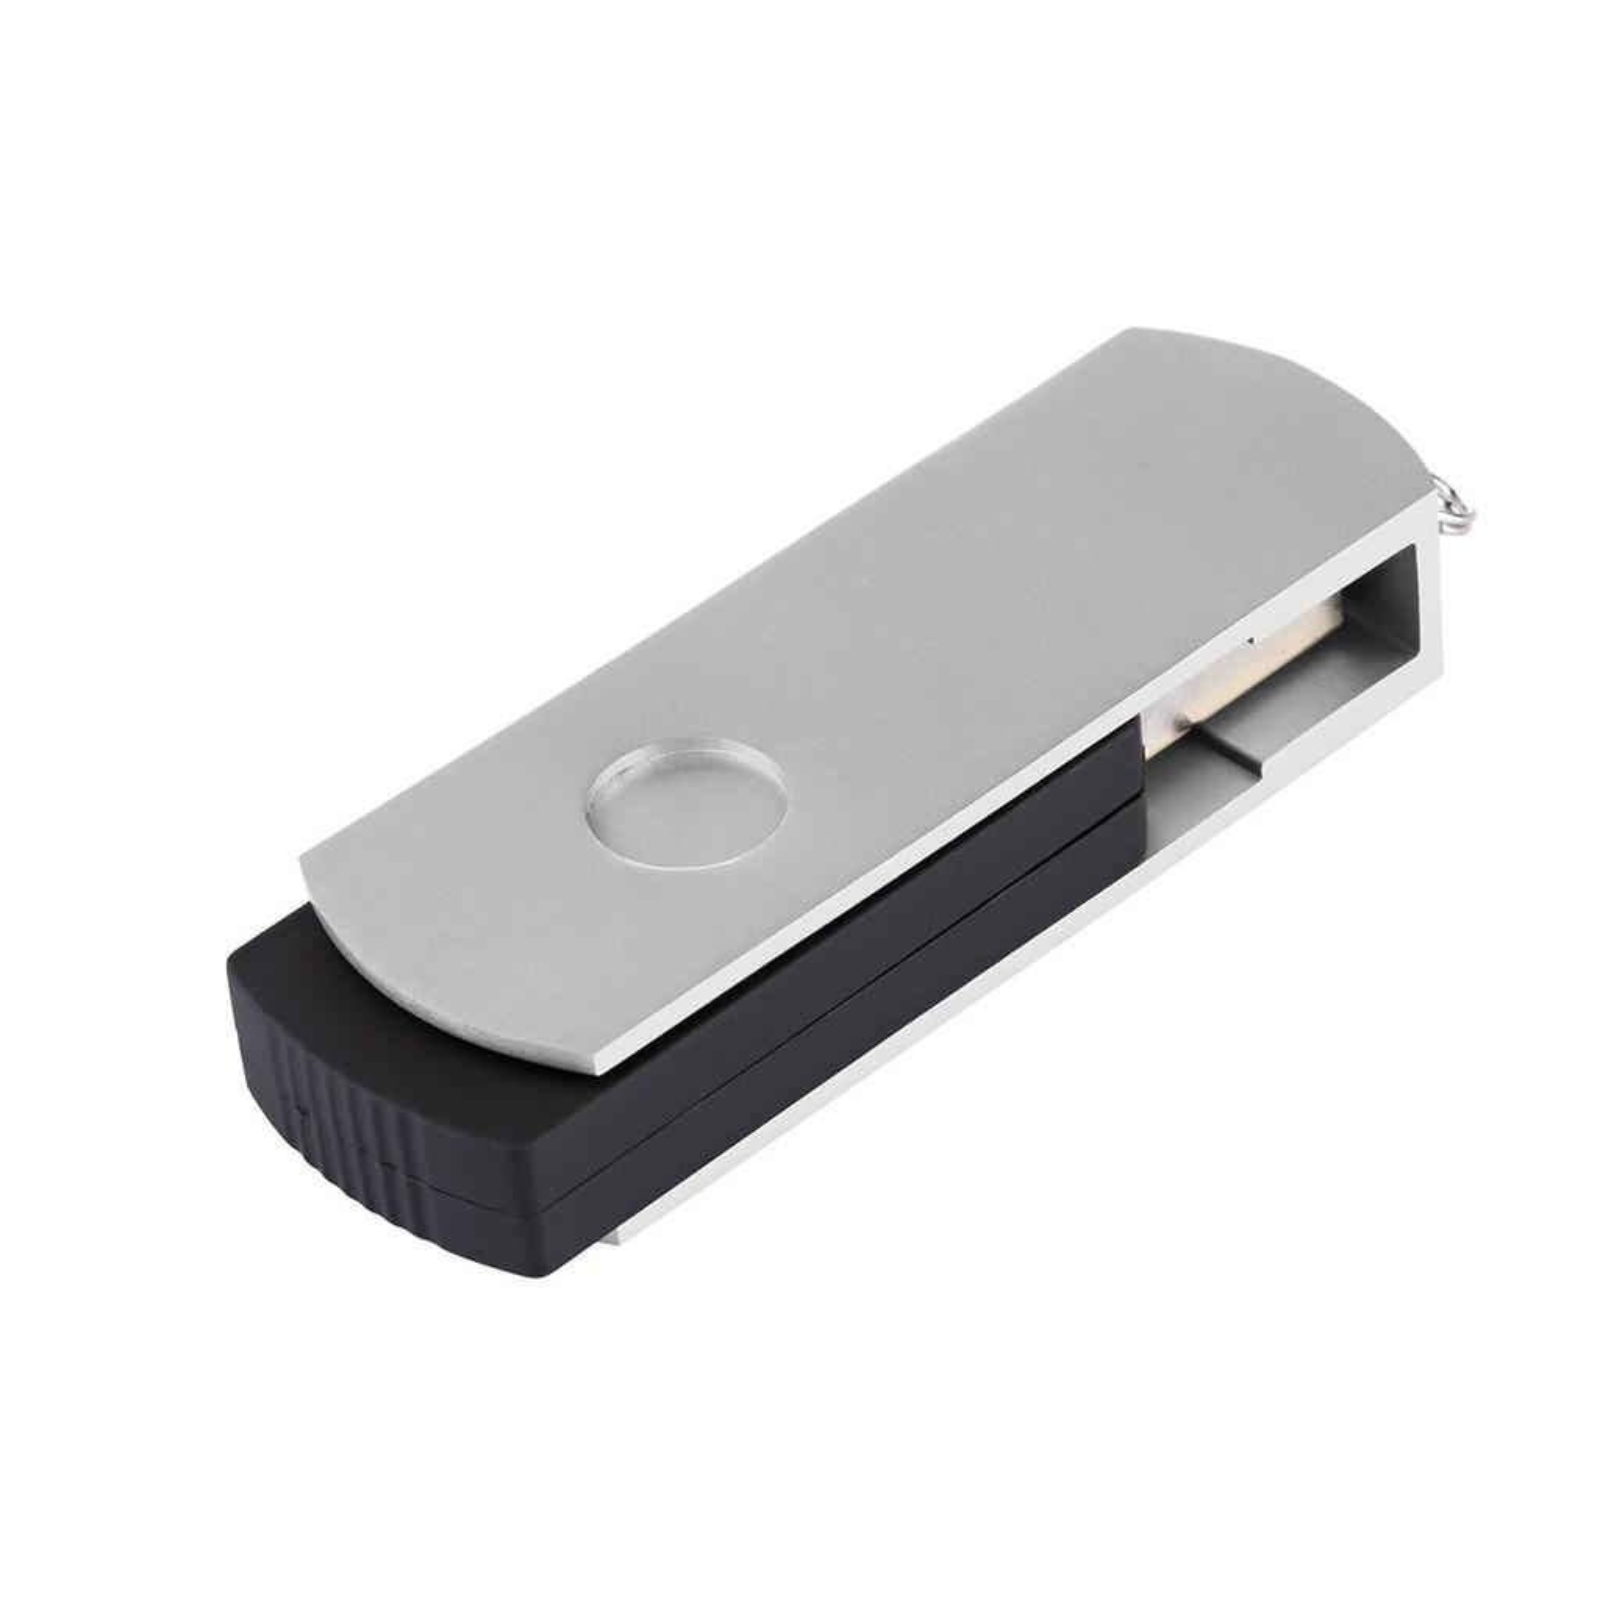 USB флеш накопитель eXceleram 8GB P2 Series Silver/Black USB 2.0 (EXP2U2SIB08) изображение 6